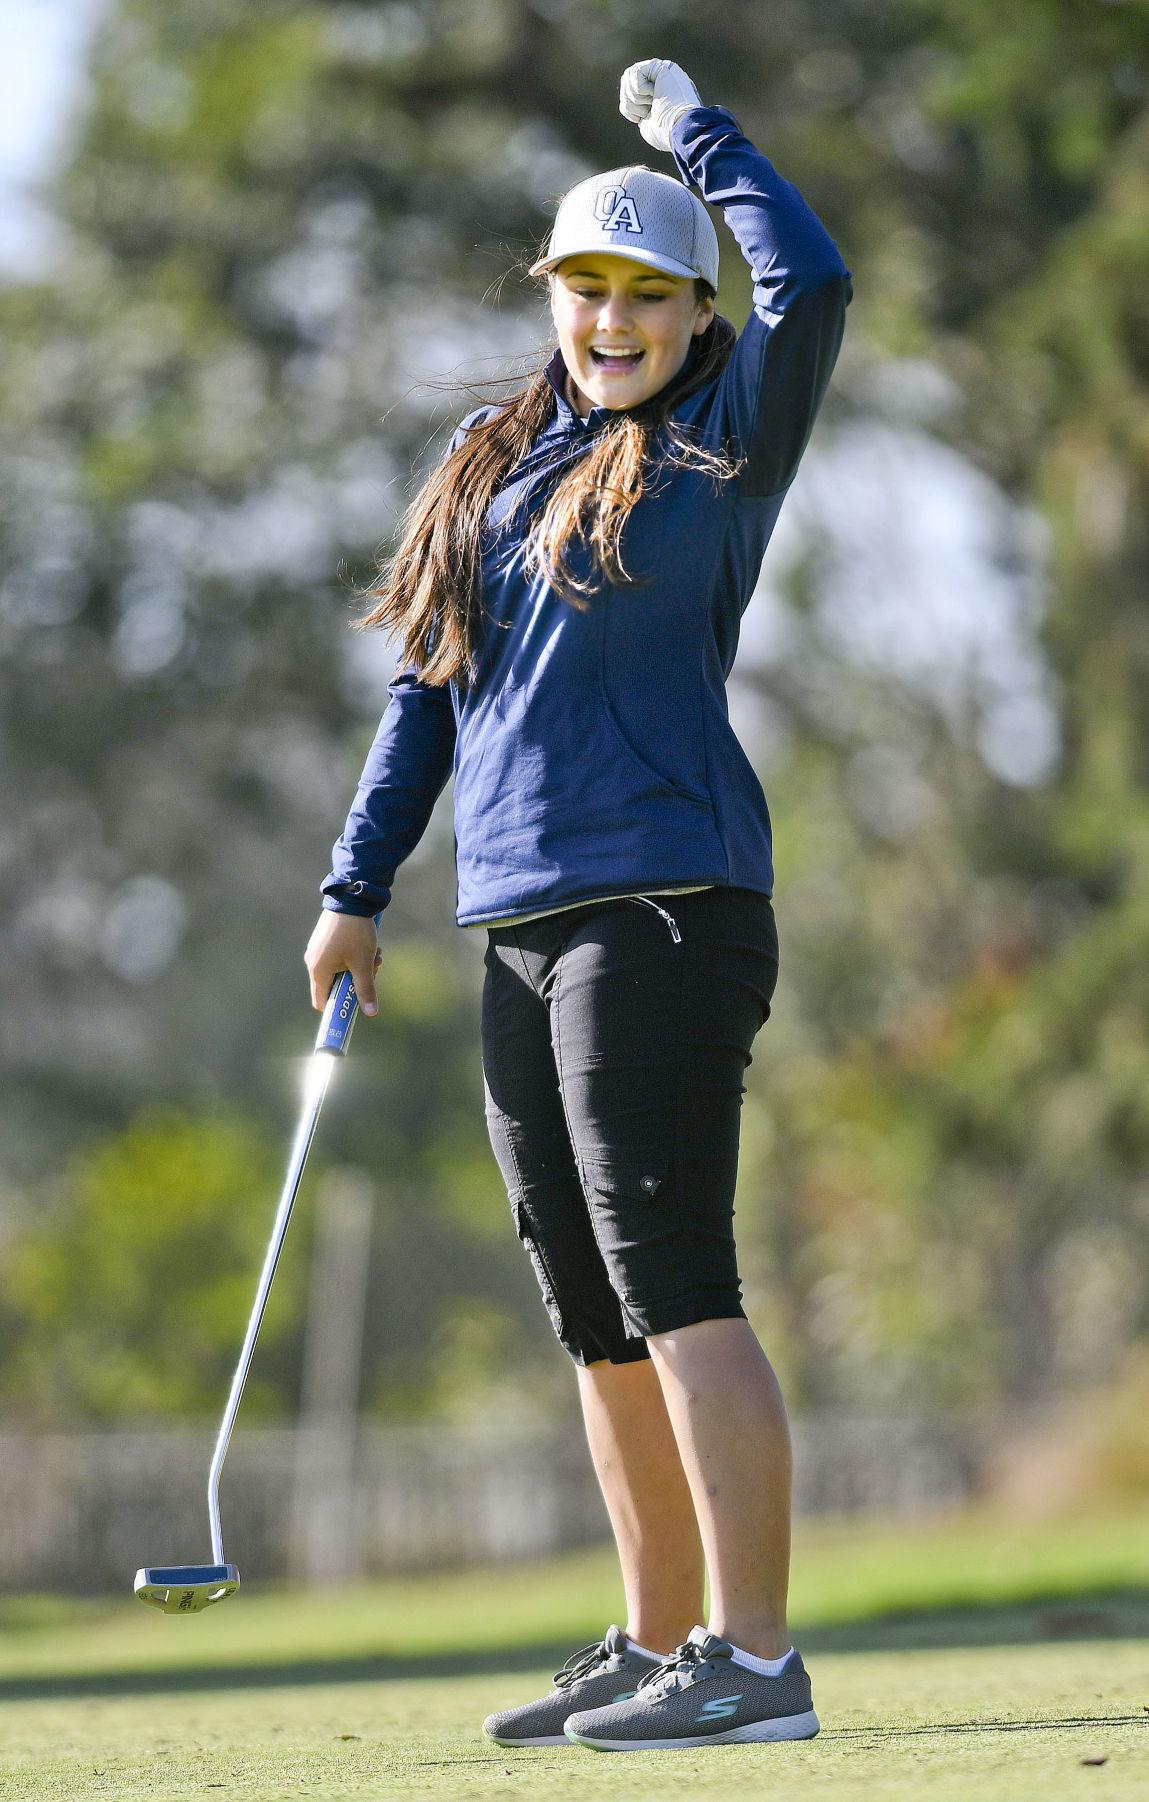 093019 OA SJ golf 01.jpg